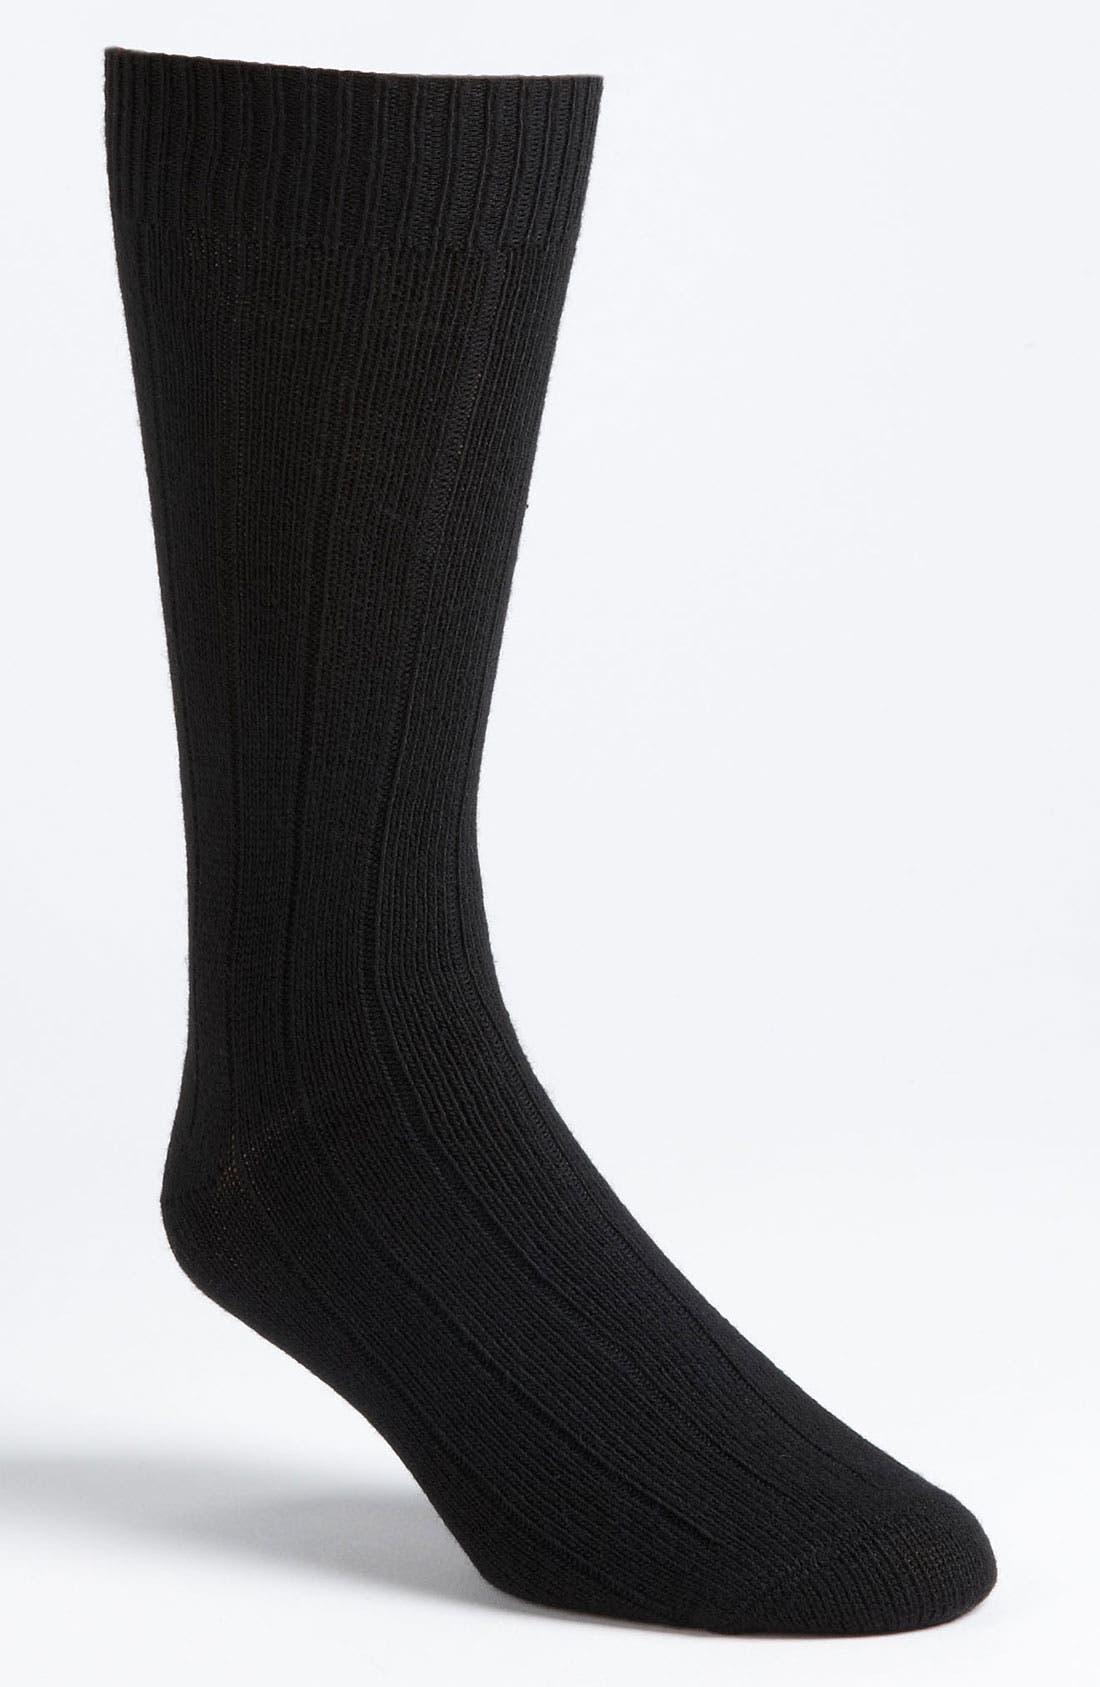 Alternate Image 1 Selected - Lorenzo Uomo Rib Socks